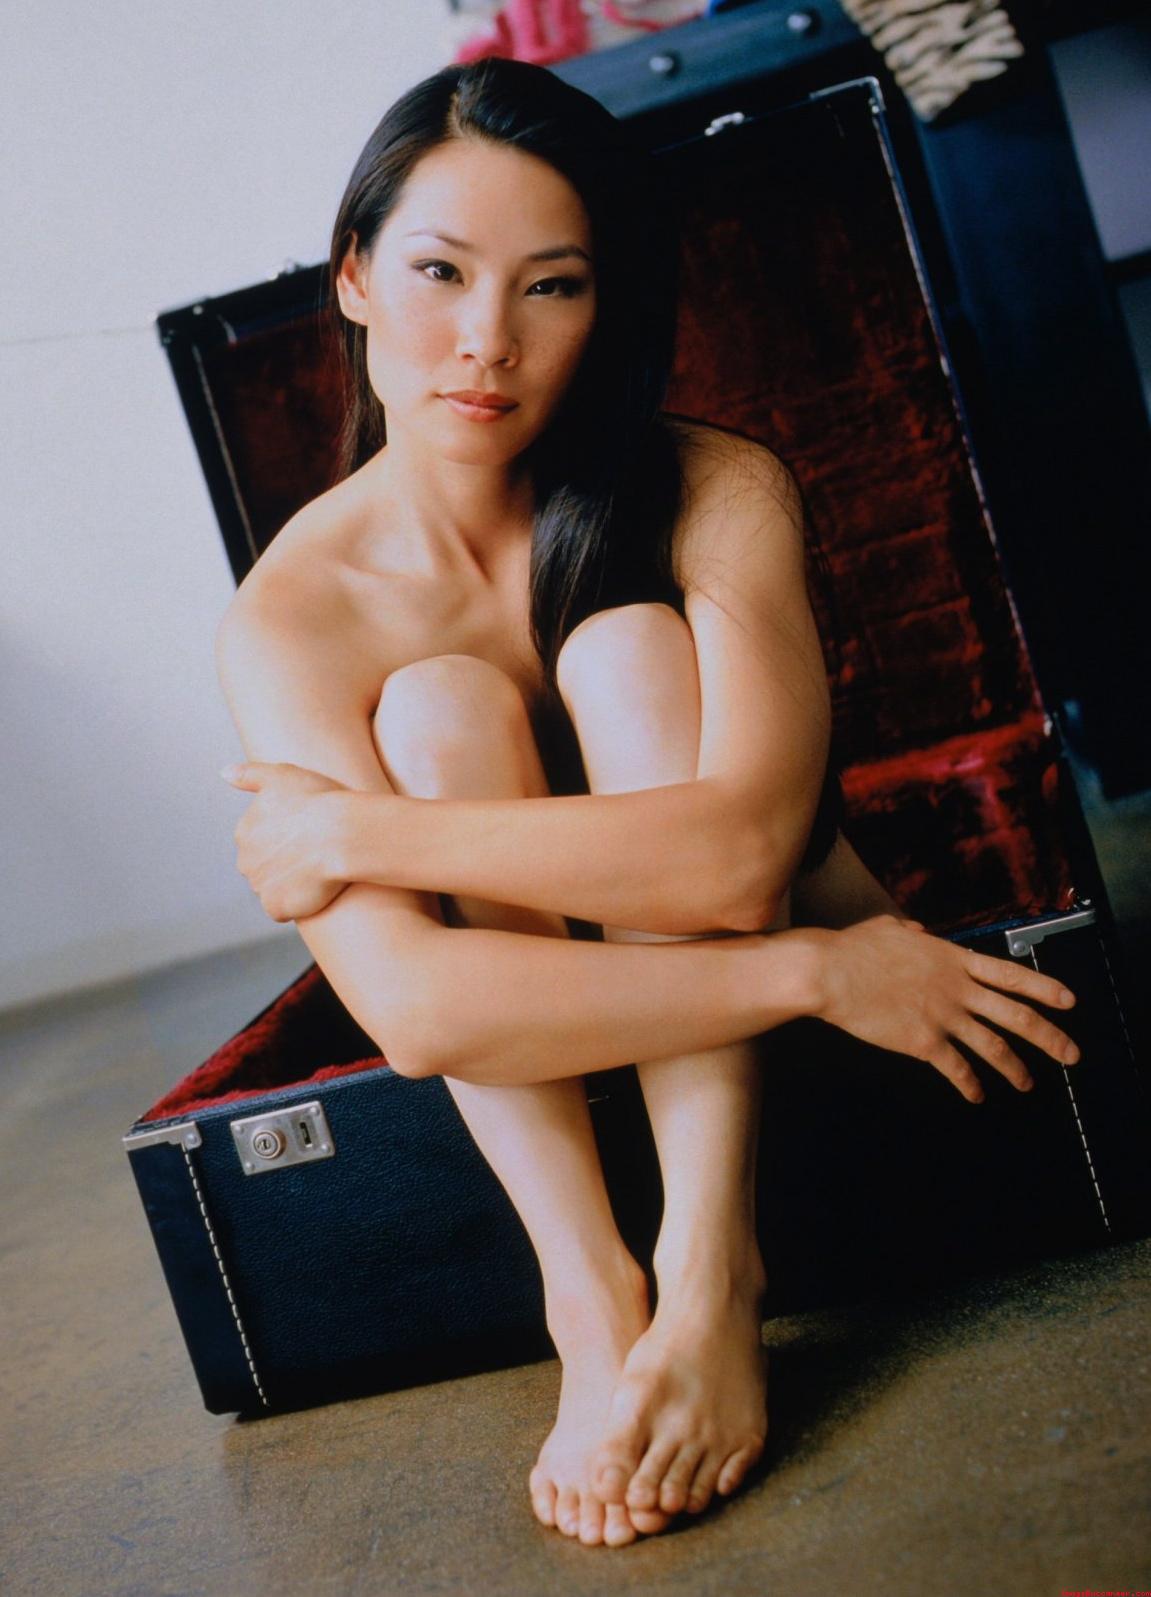 Lucy Pinder desnuda - haztepajascom